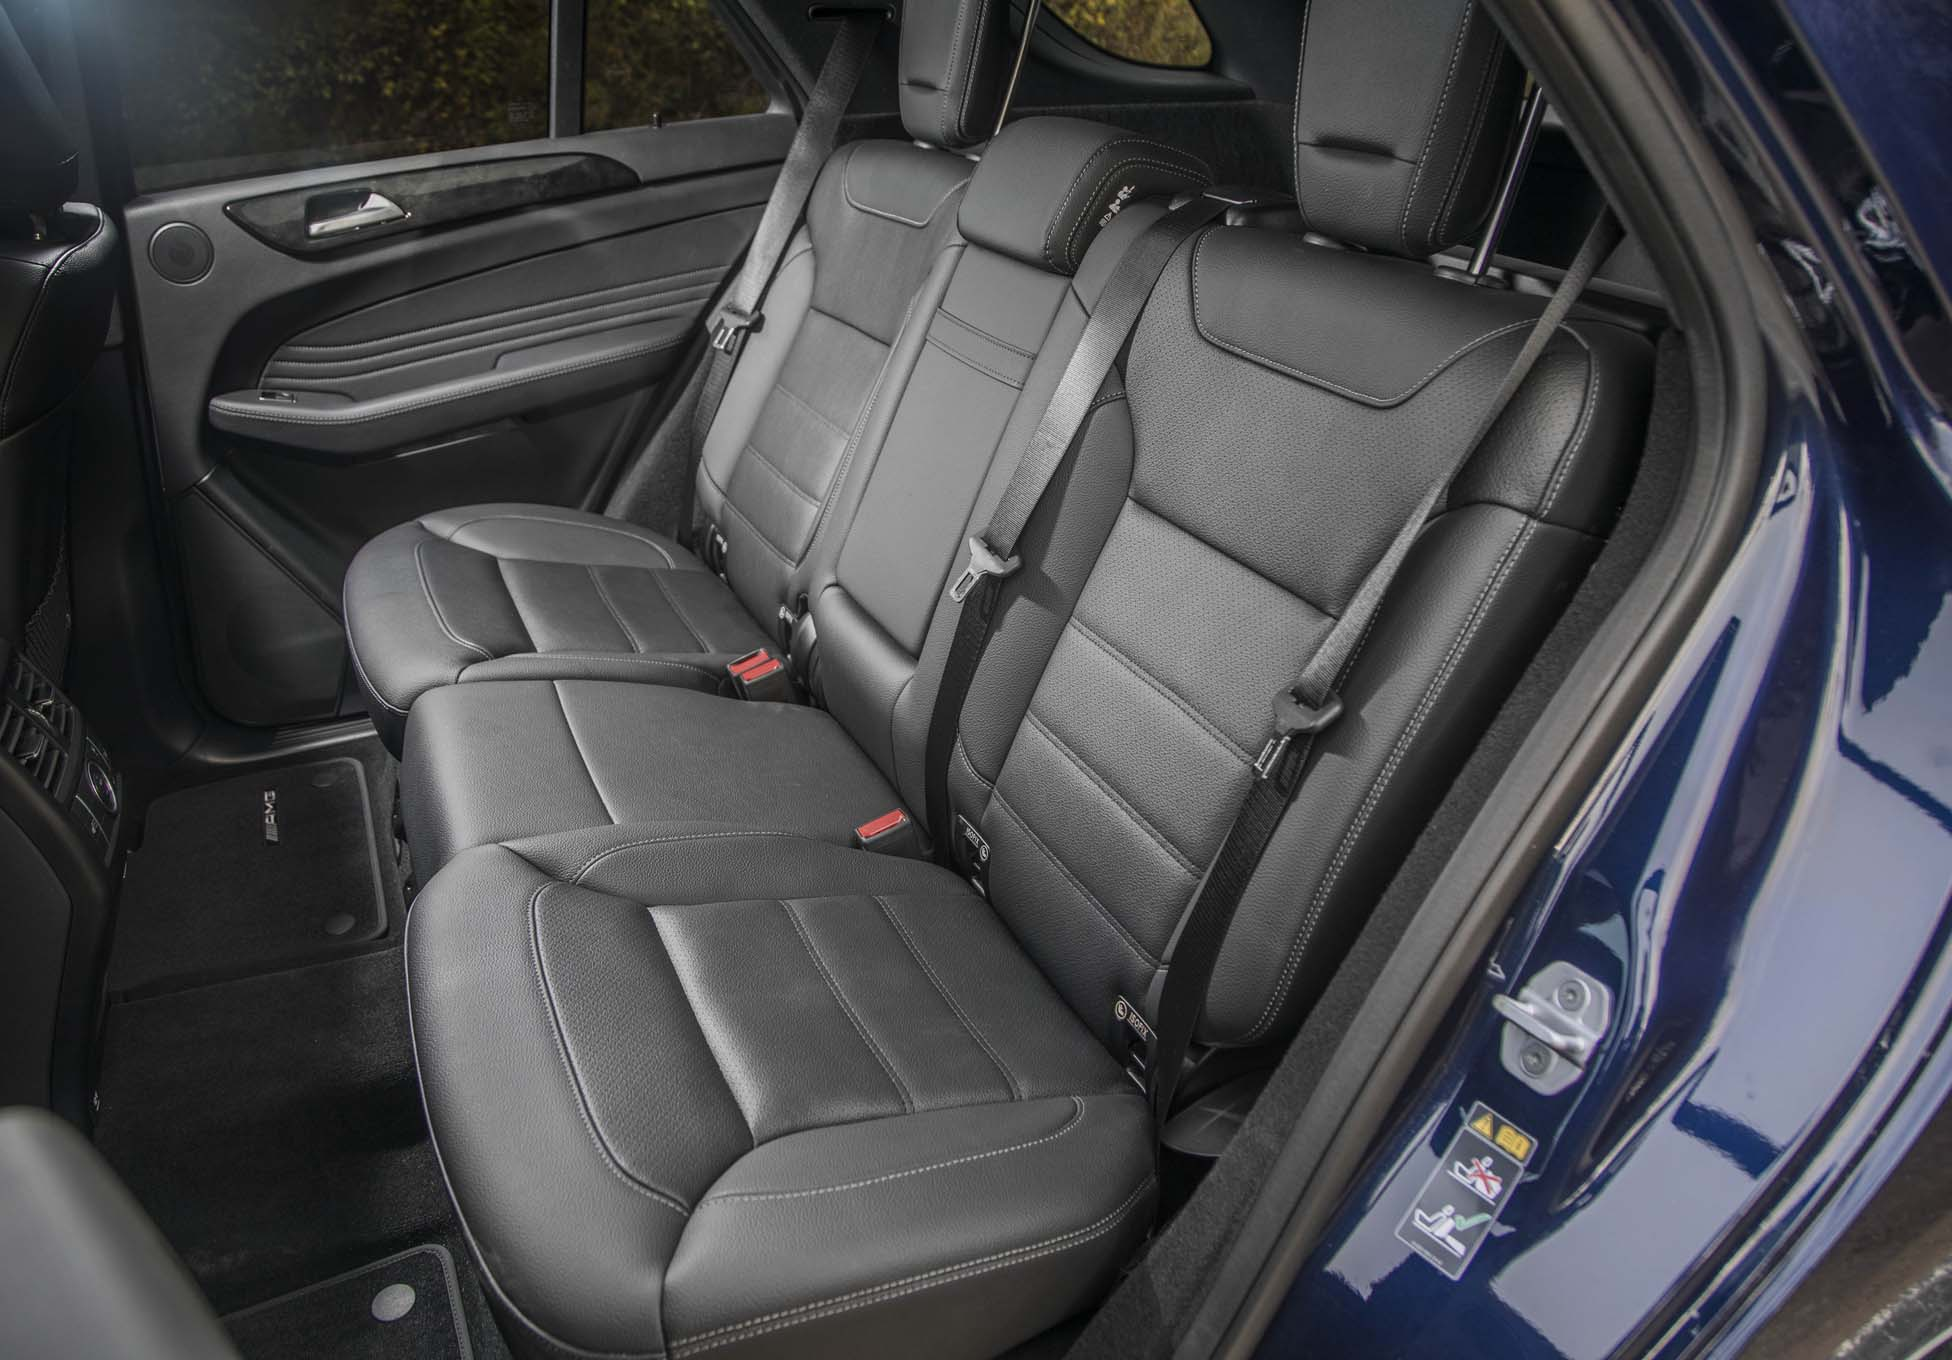 http://st.automobilemag.com/uploads/sites/10/2017/02/2017-Mercedes-AMG-GLE43-rear-interior-seats.jpg